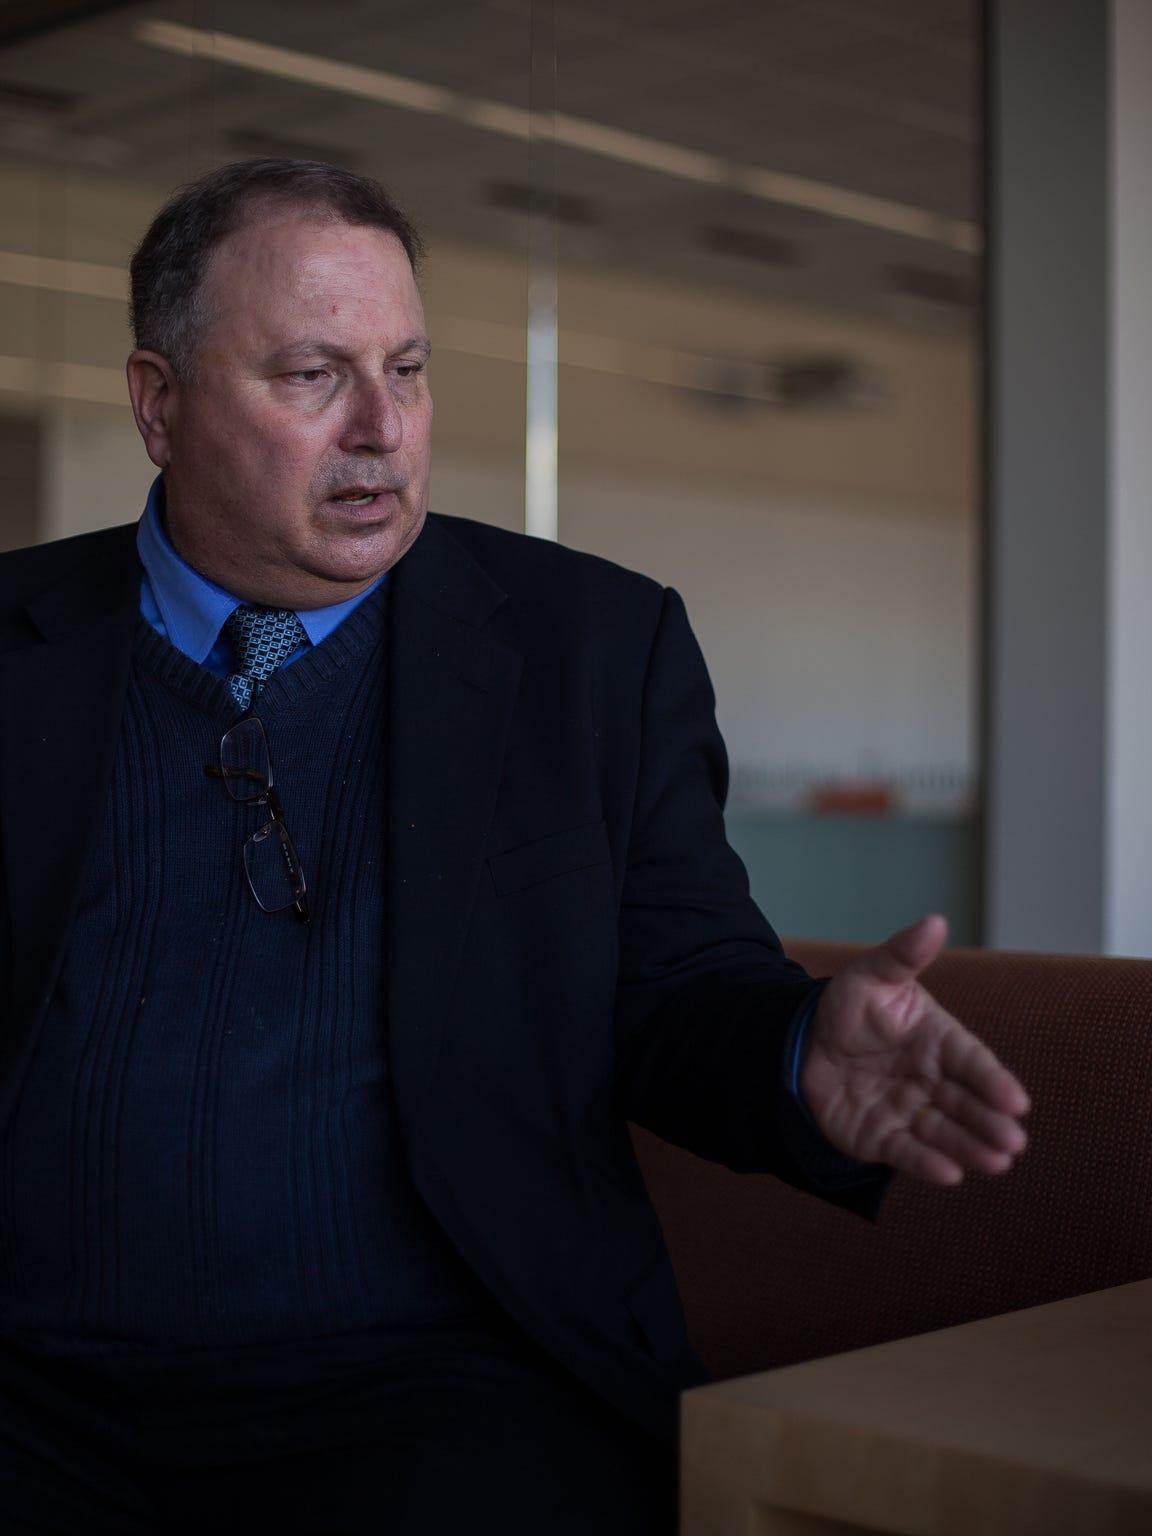 Attorney Craig Kabatchnick speaks to The Spectrum's